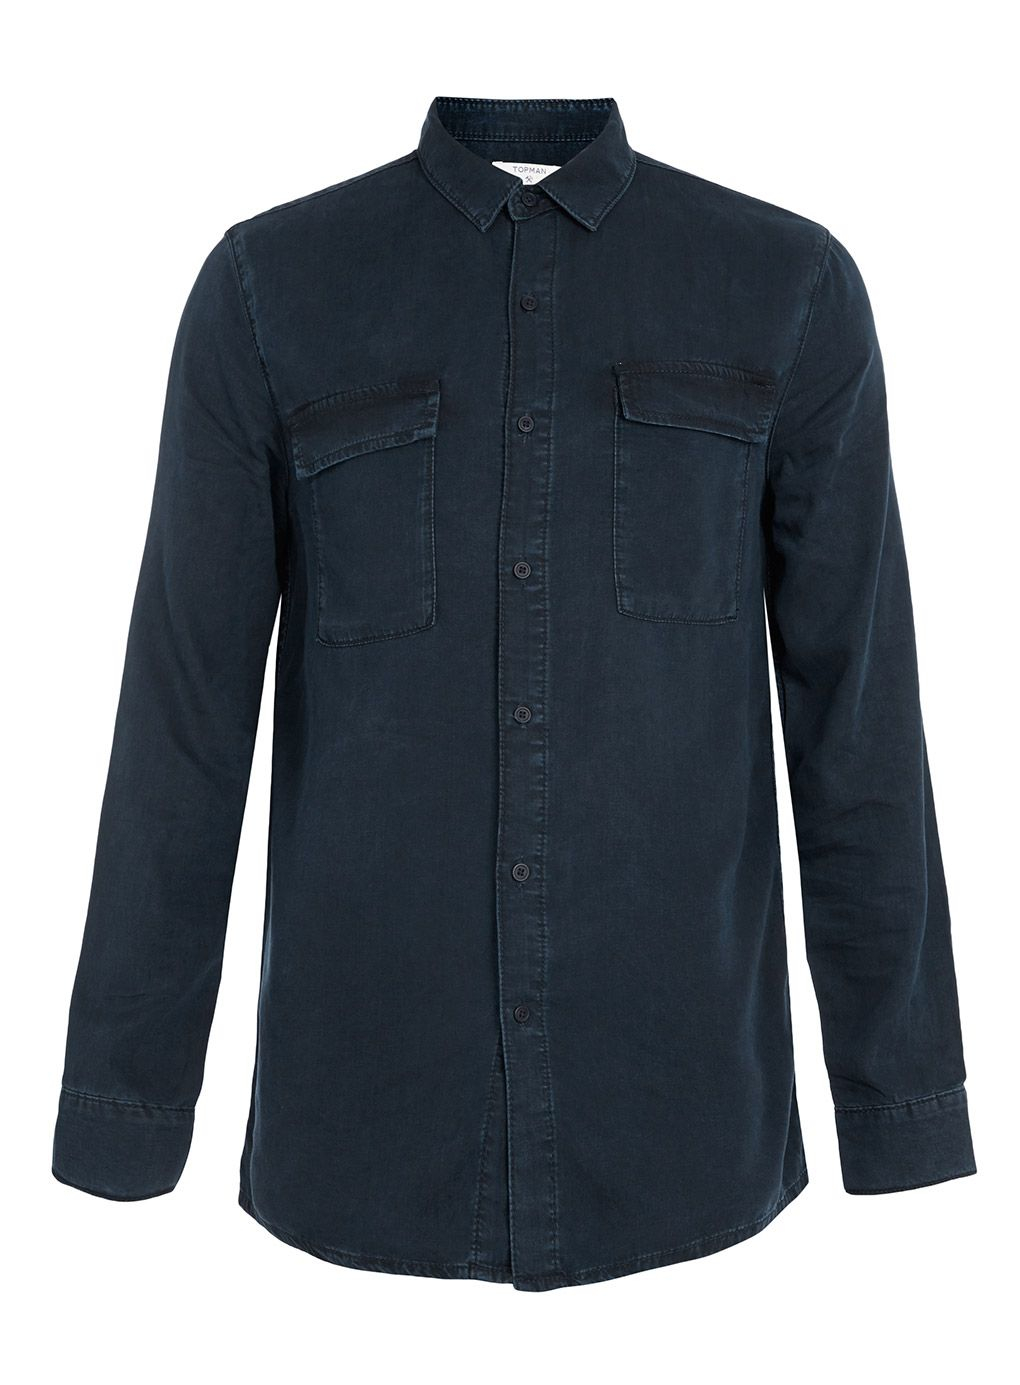 Topman Long Sleeve Denim Casual Shirt In Blue For Men